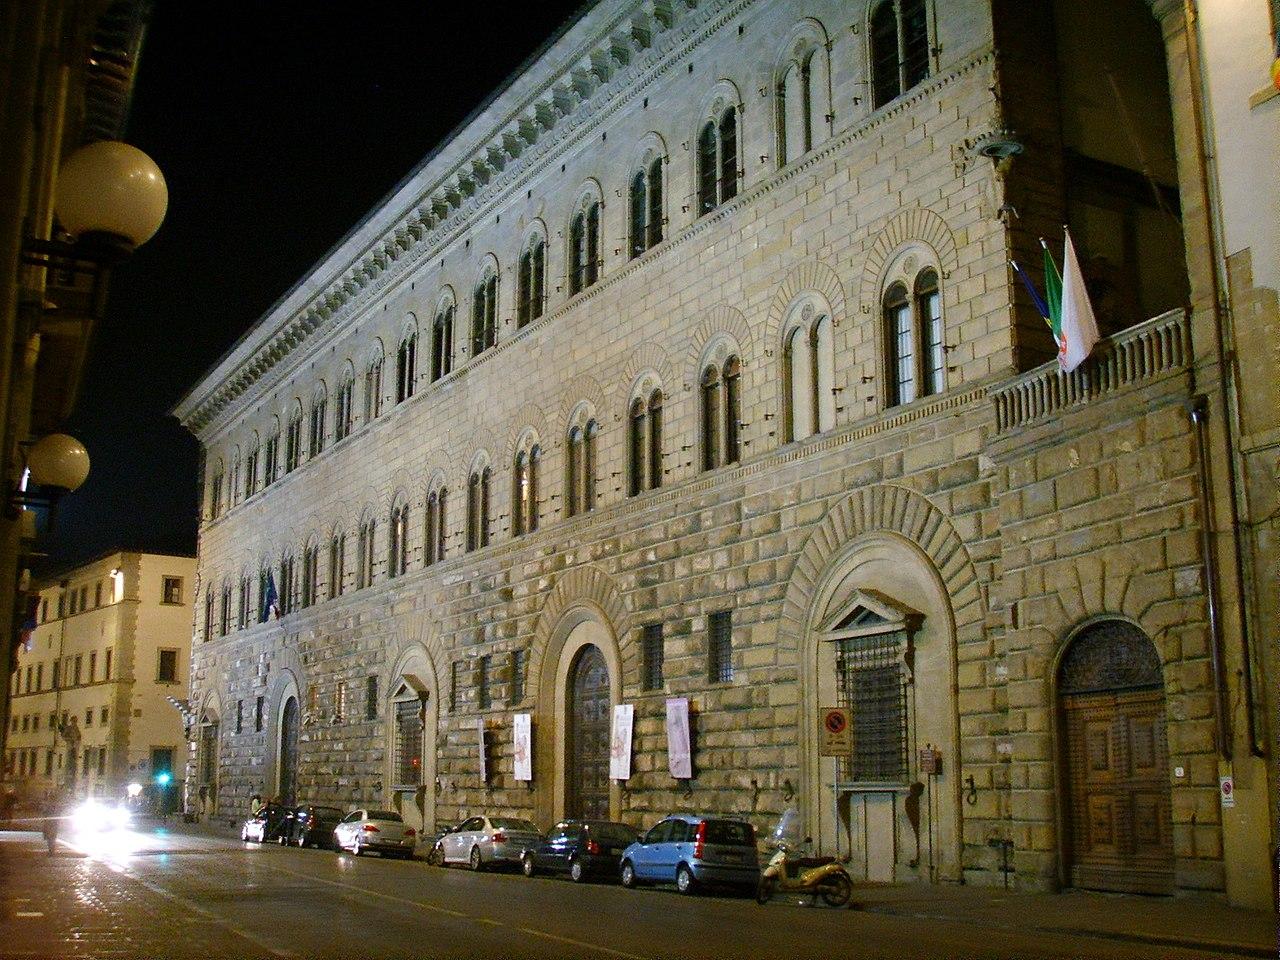 1280px-Palazzo_Medici_Riccardi_by_night_01.JPG